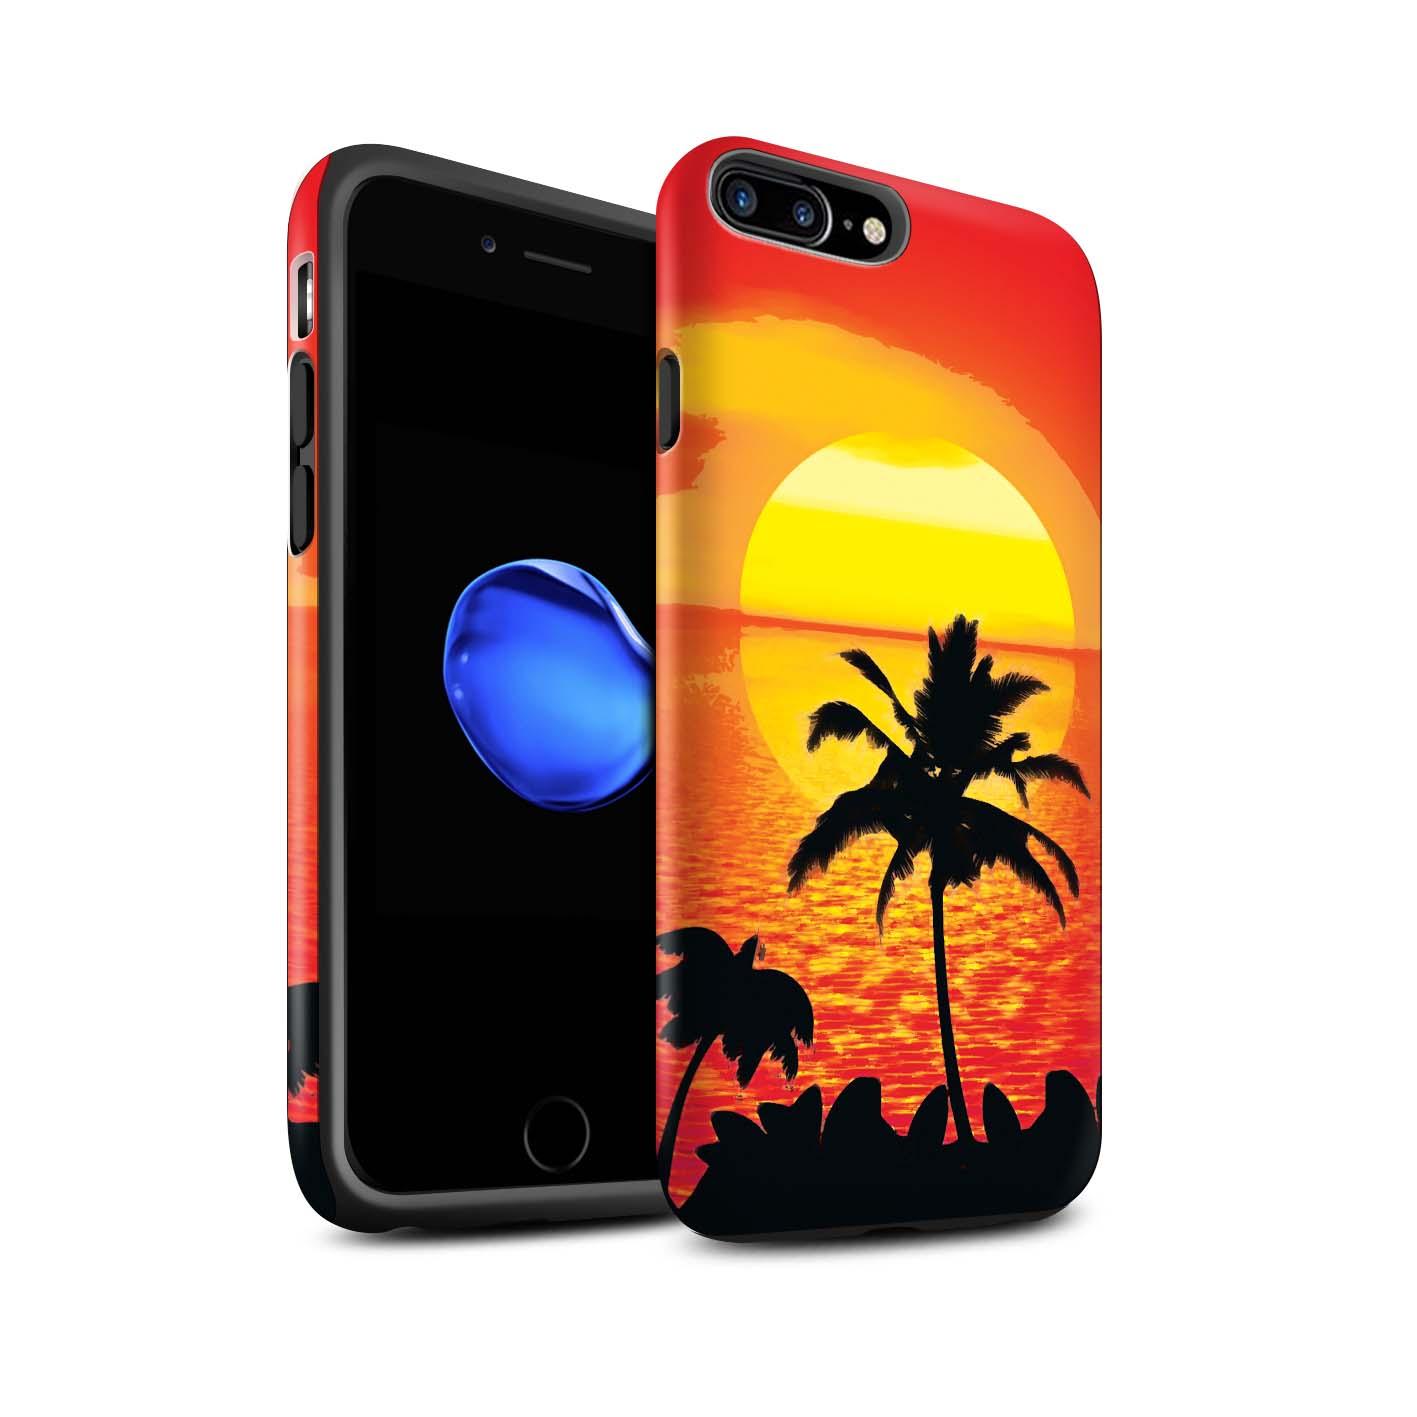 STUFF4-Matte-Tough-Phone-Case-for-Apple-iPhone-8-Plus-Beautiful-World-Art